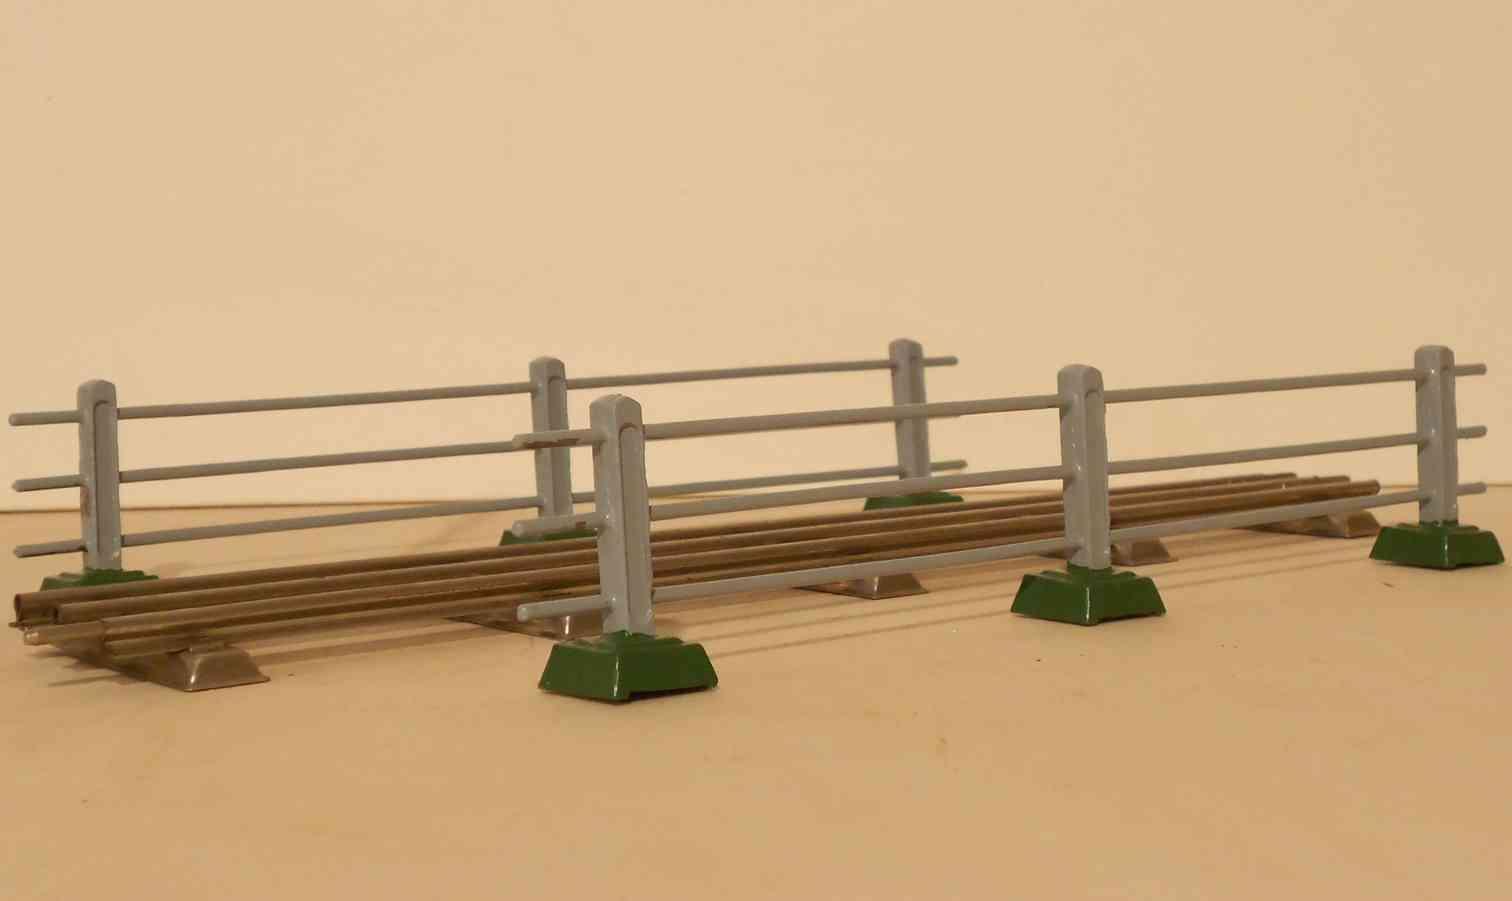 ditmar g3 21.704 railway toy railing gauge 0